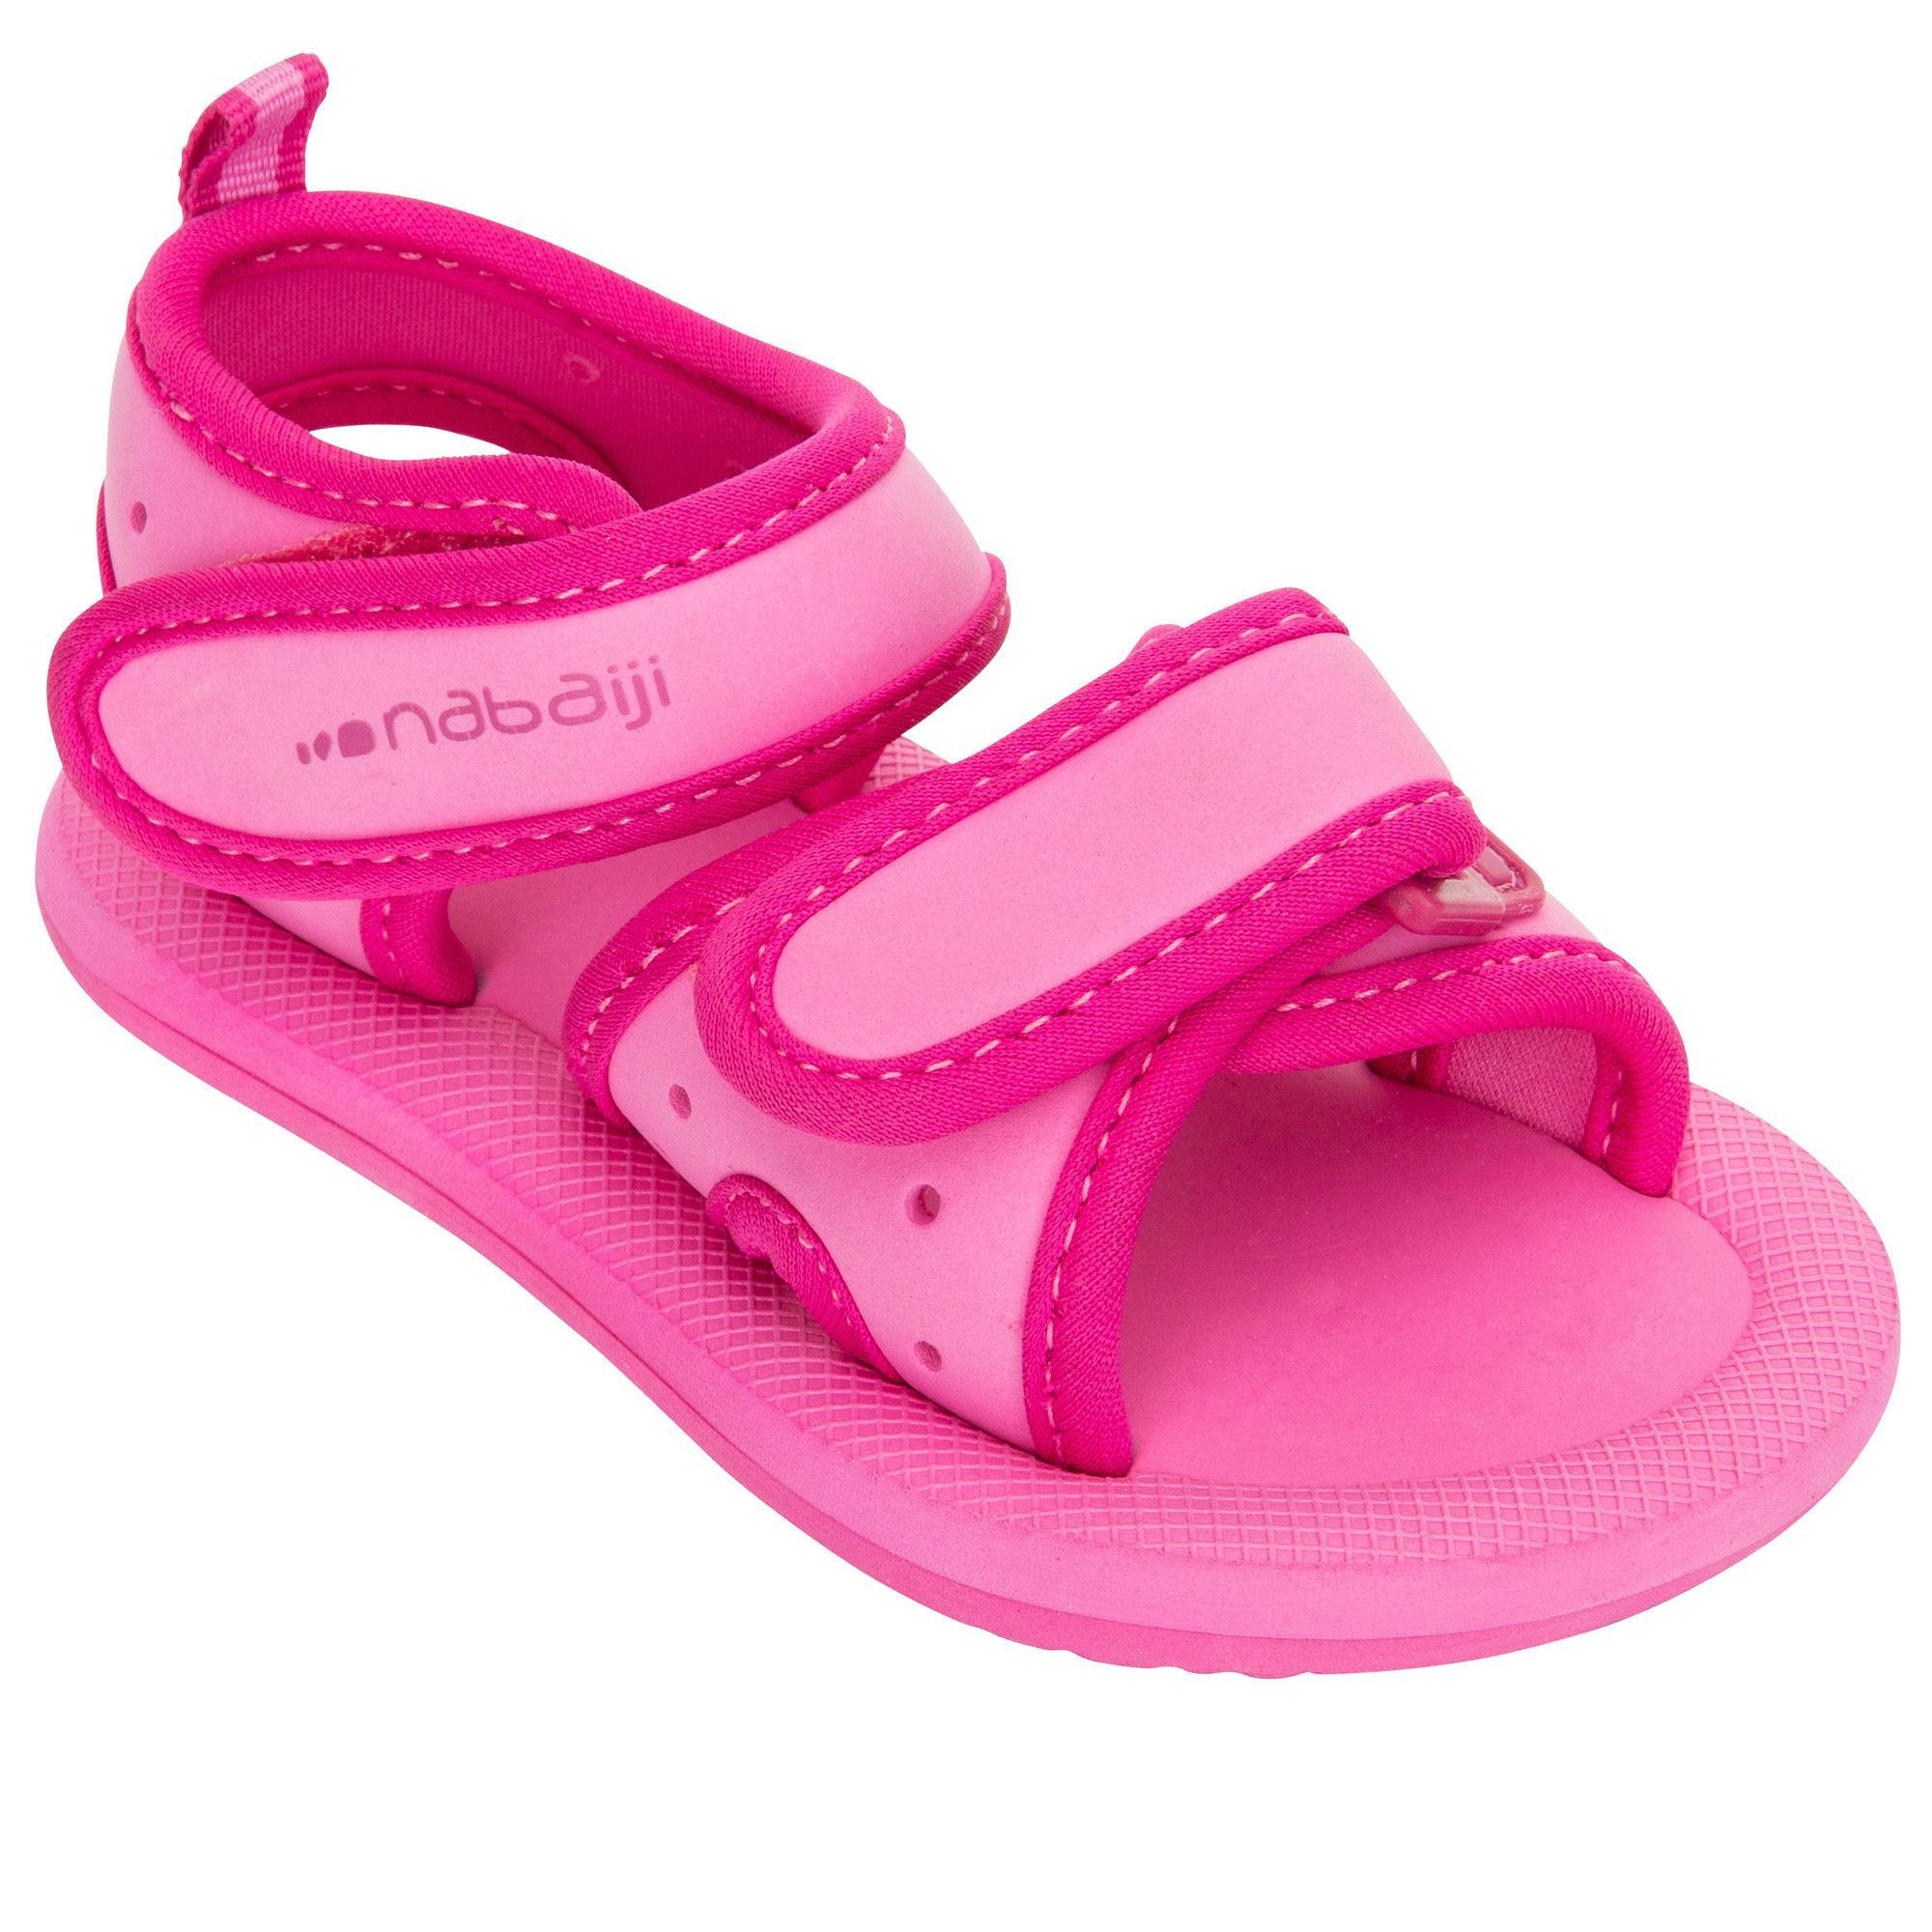 b1e97e153ae chaussure bebe piscine